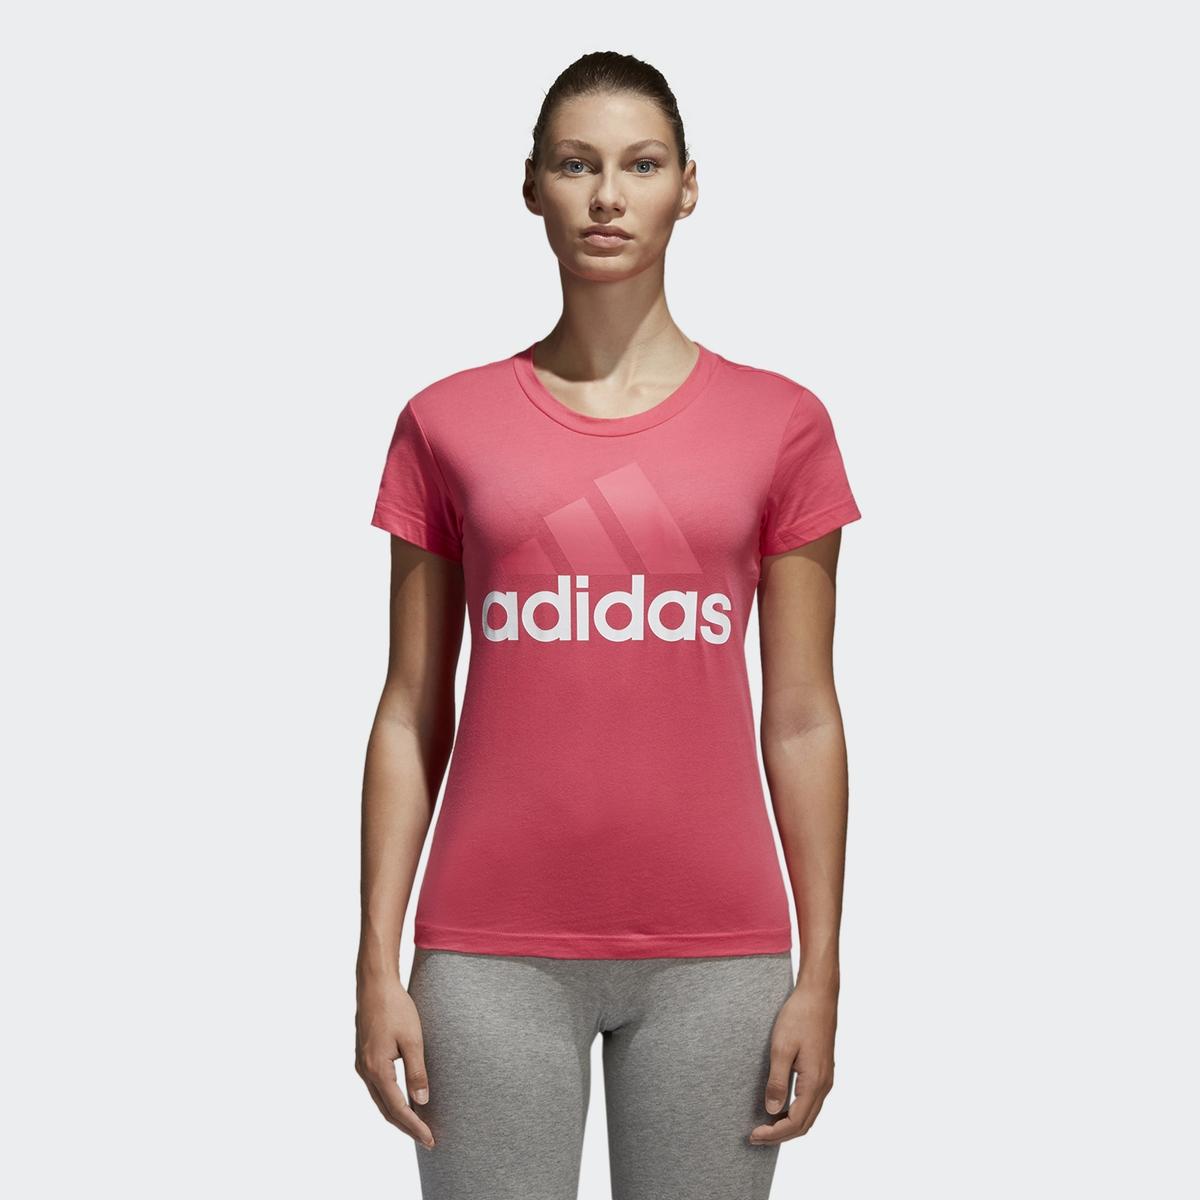 Camiseta de manga corta, cuello redondo